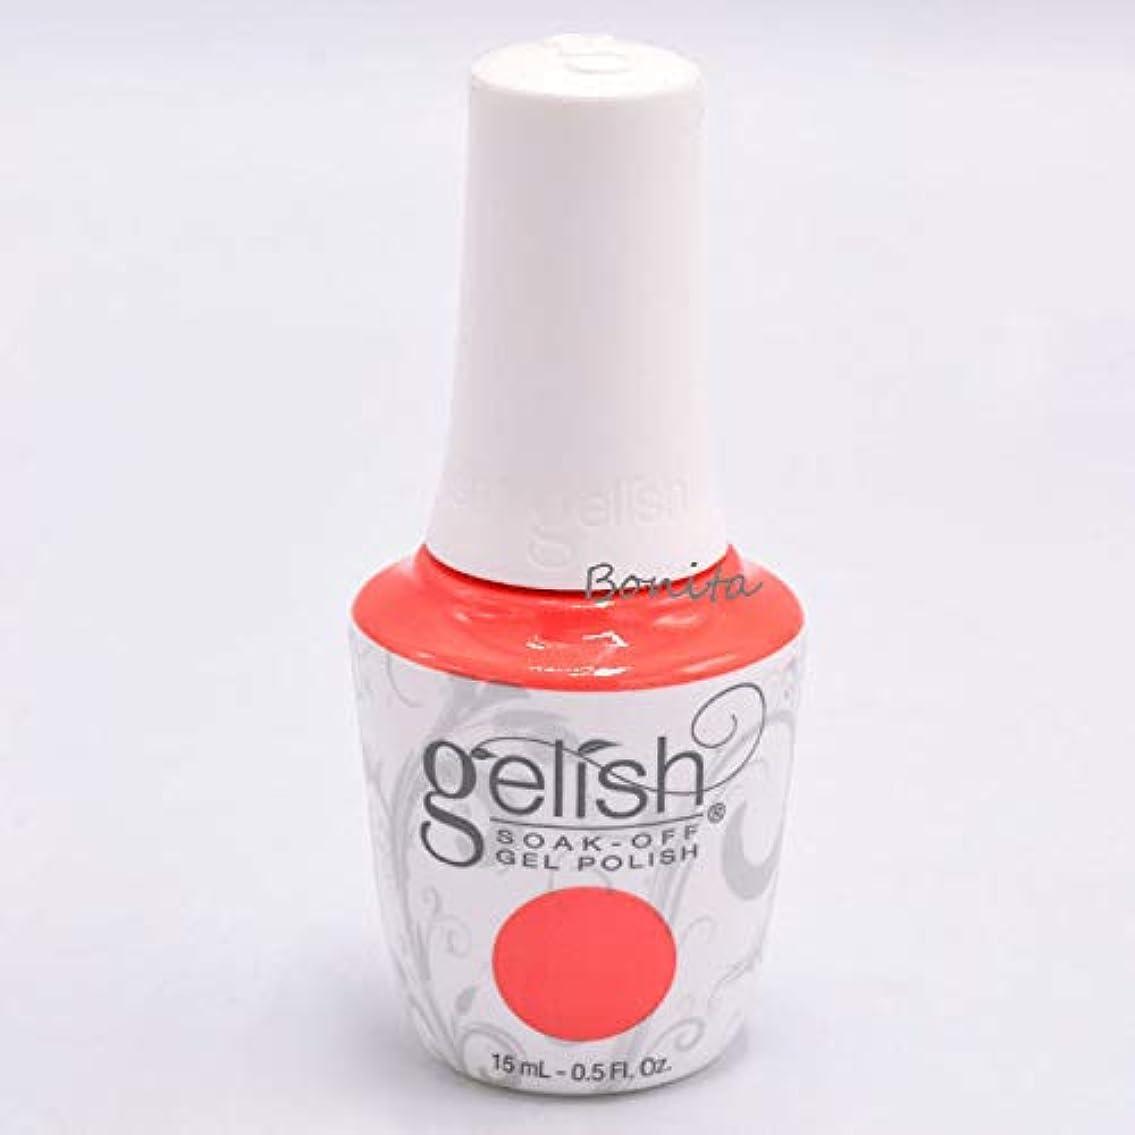 Gelish Soak-Off Gel - Sun Kissed Bliss - 15 ml / 0.5 oz